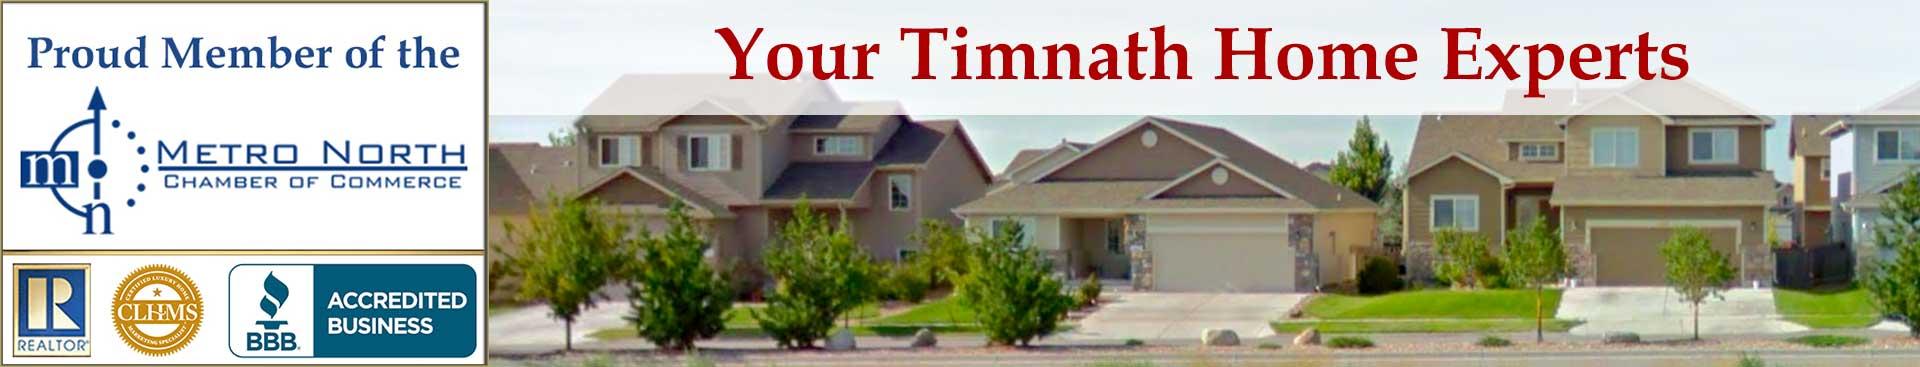 Timnath Accreditations Banner